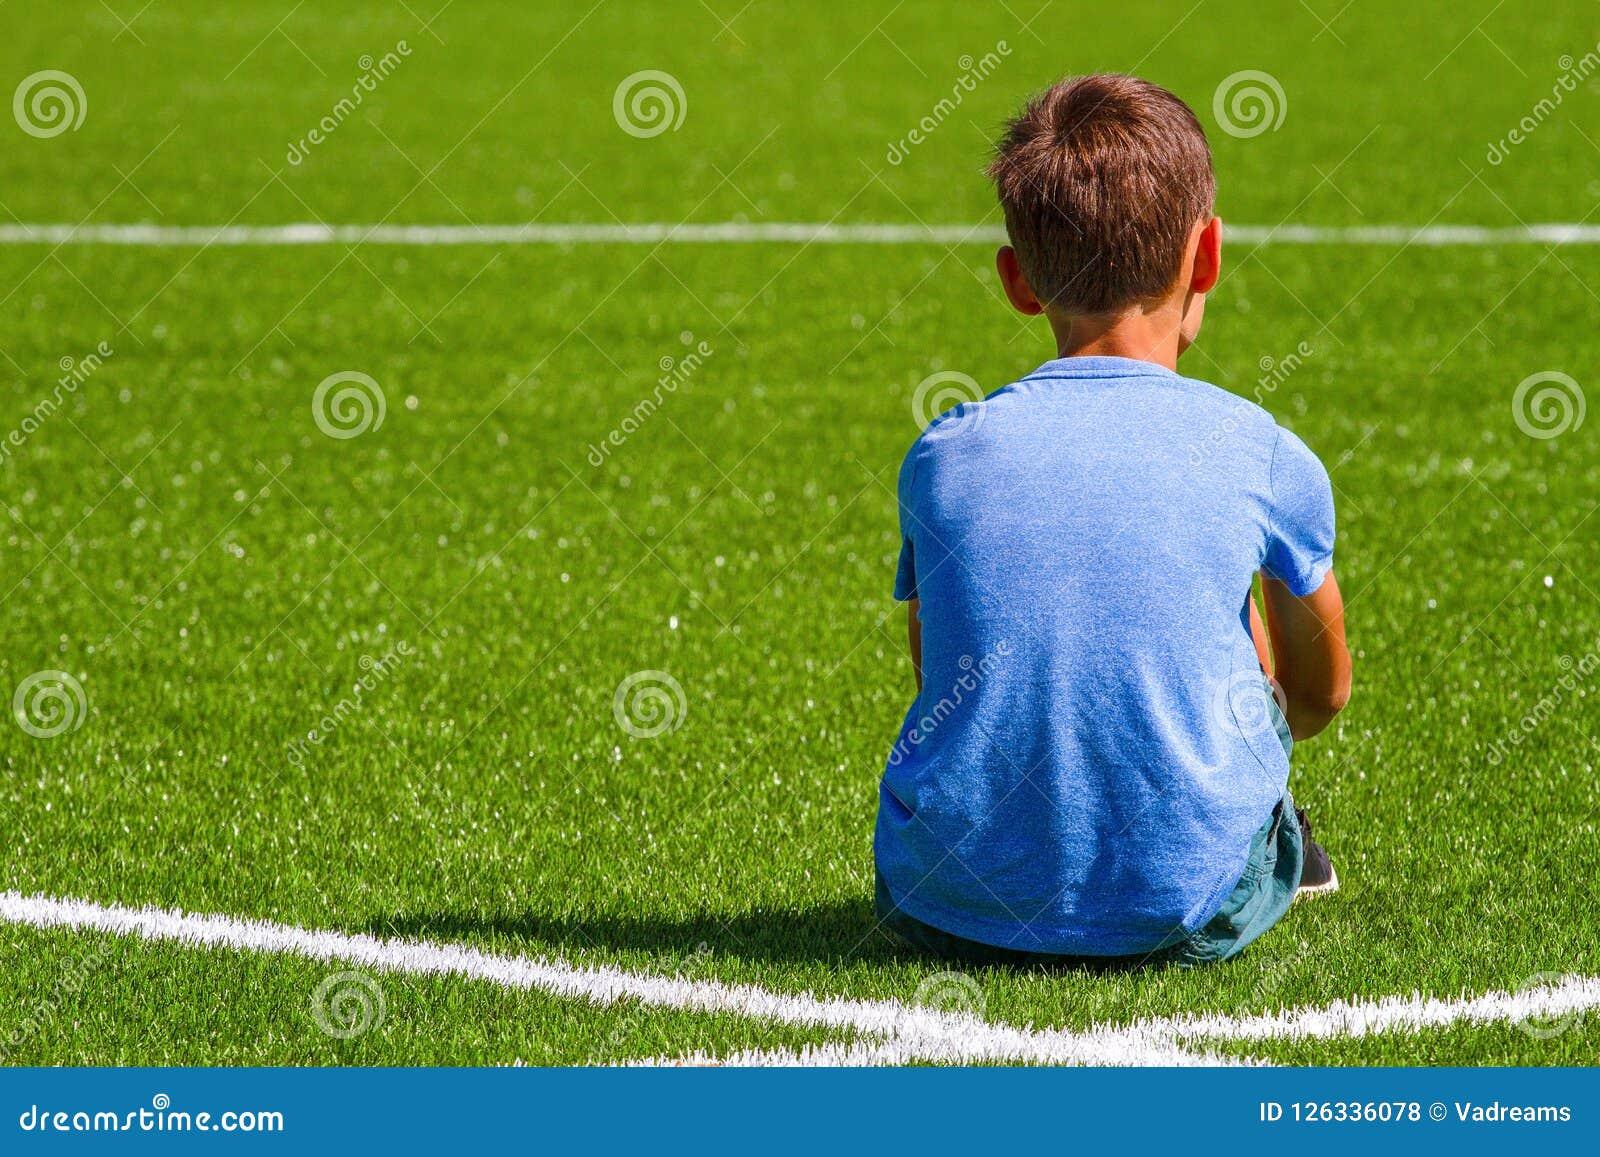 sad alone boy sitting in soccer field stadium outdoors stock photo